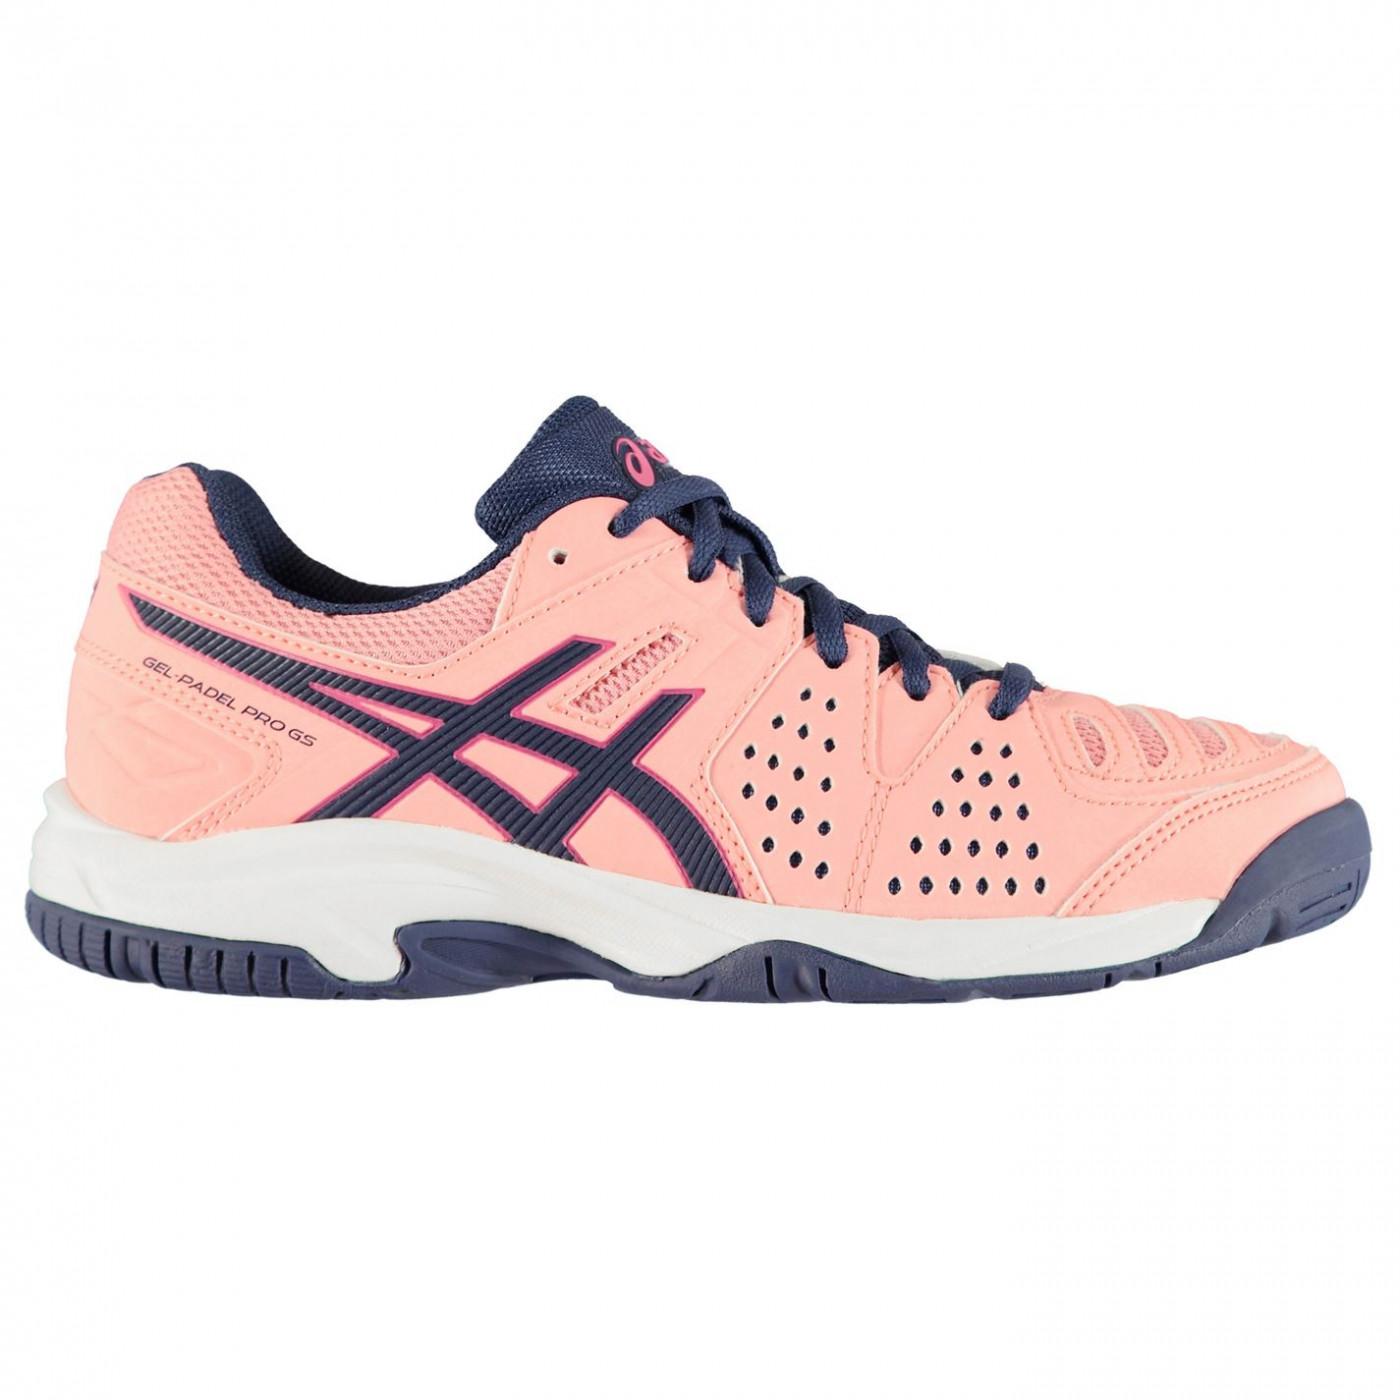 Asics Gel Padel Pro 3 GS Junior Tennis Shoes